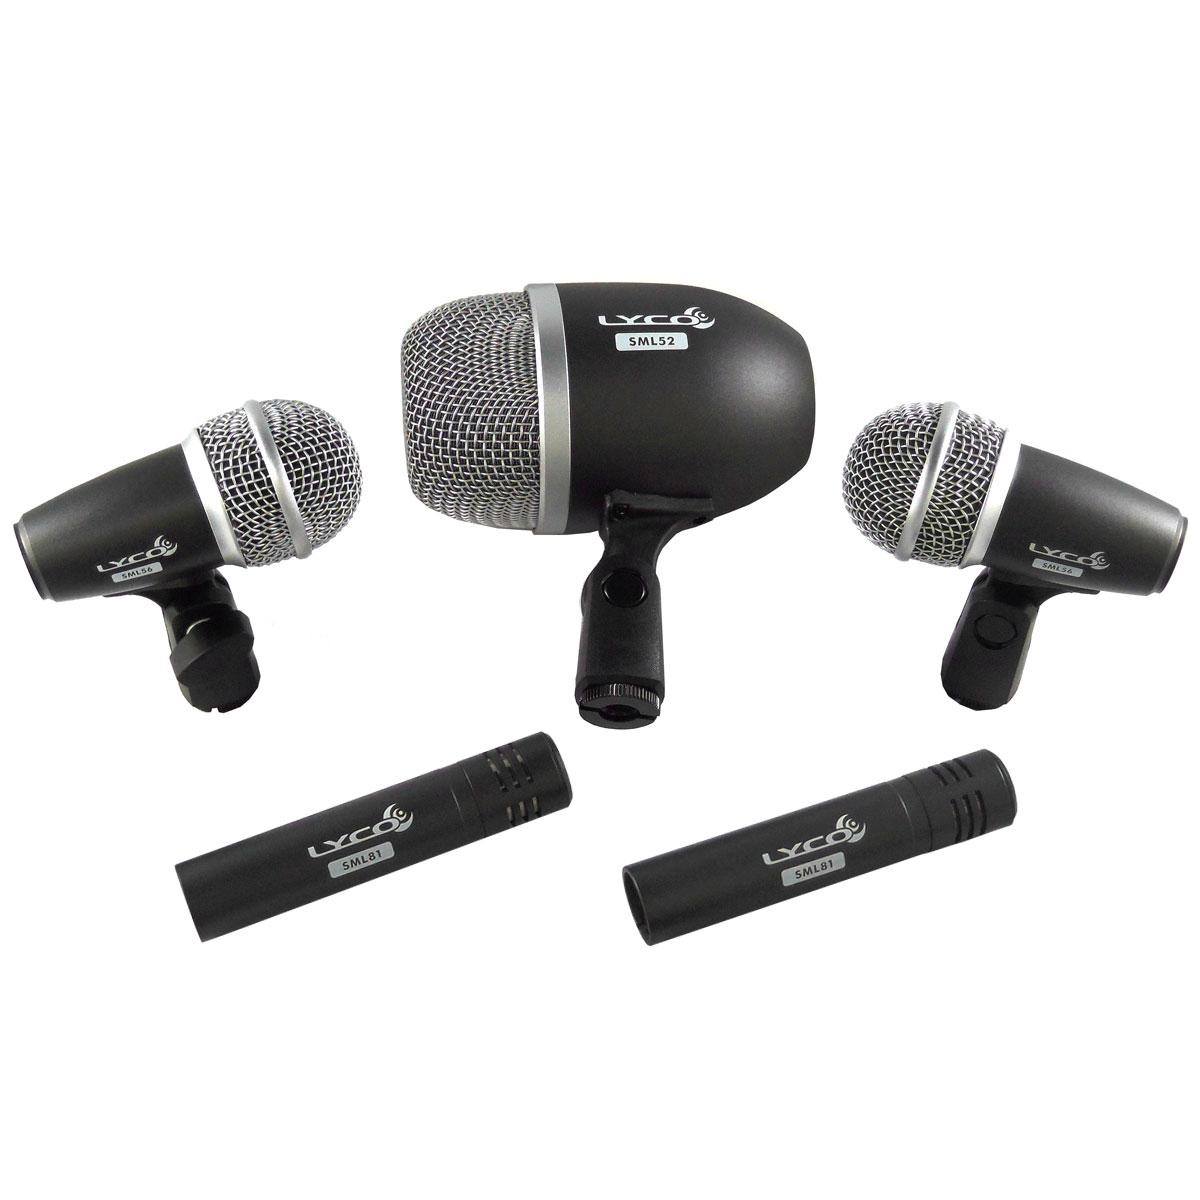 LDK5PRO - Kit 5 Microfones c/ Fio p/ Bateria LDK 5 PRO - Lyco